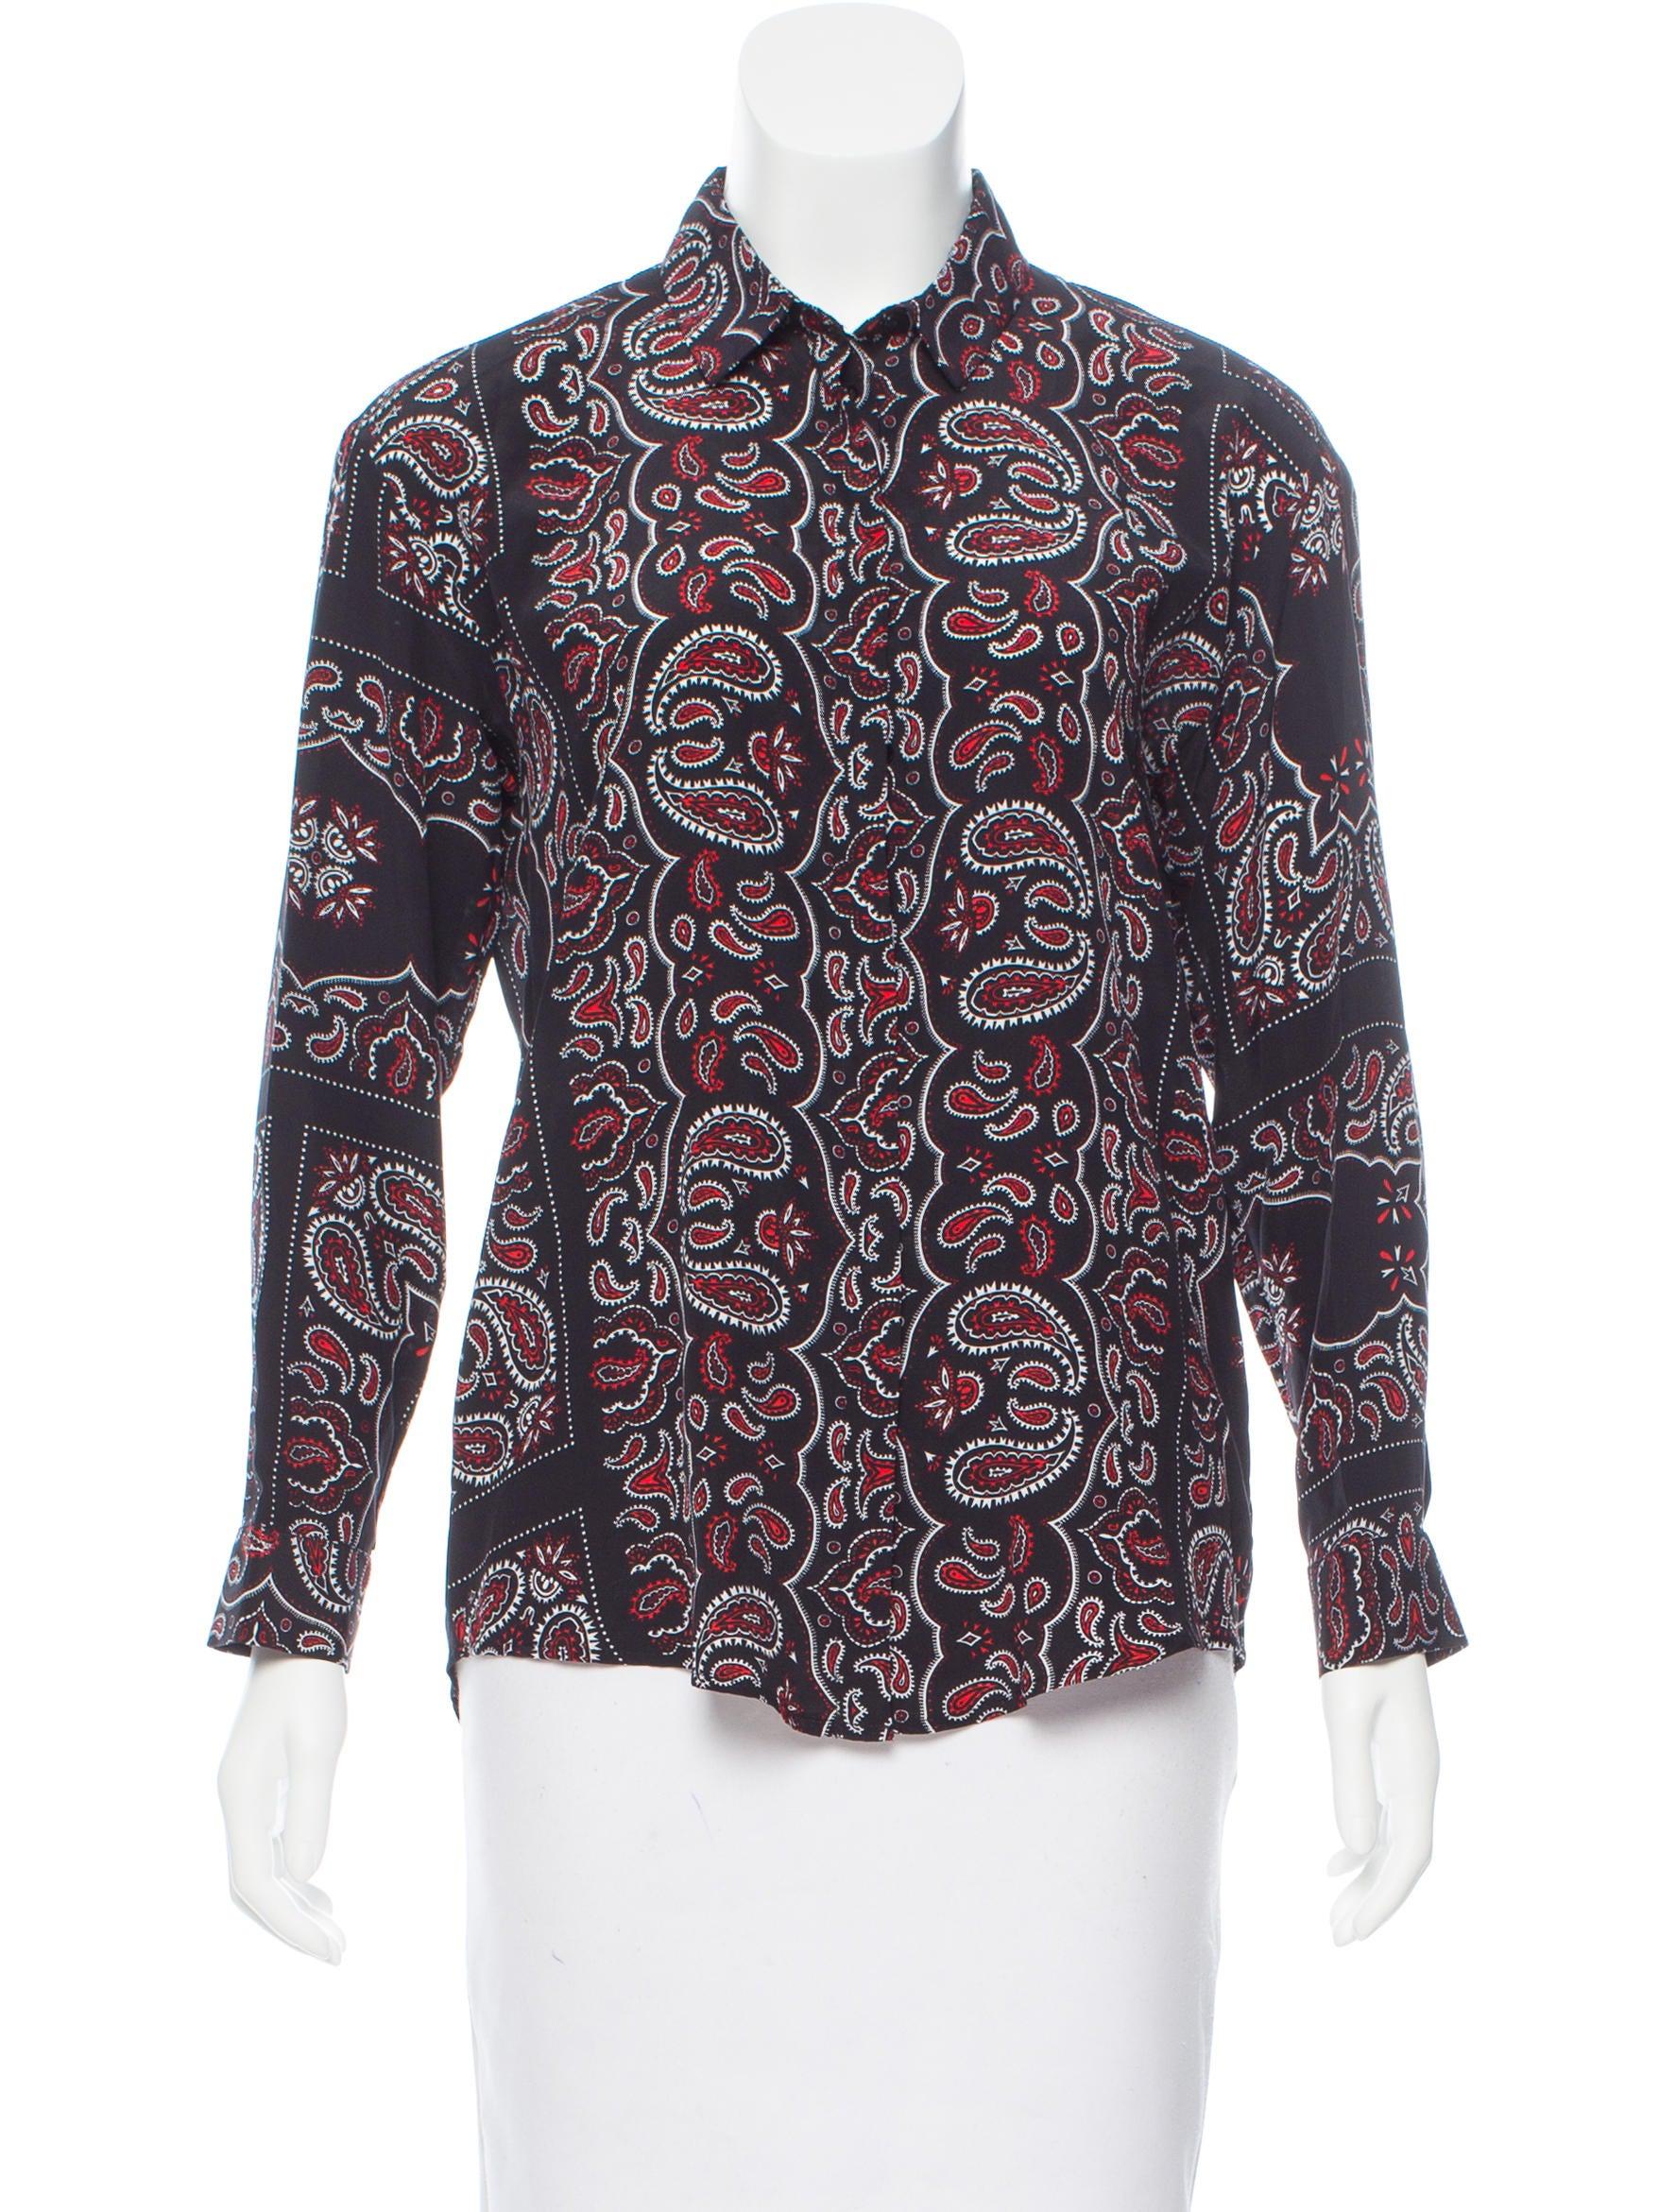 Sandro Bandana Print Silk Top - Clothing